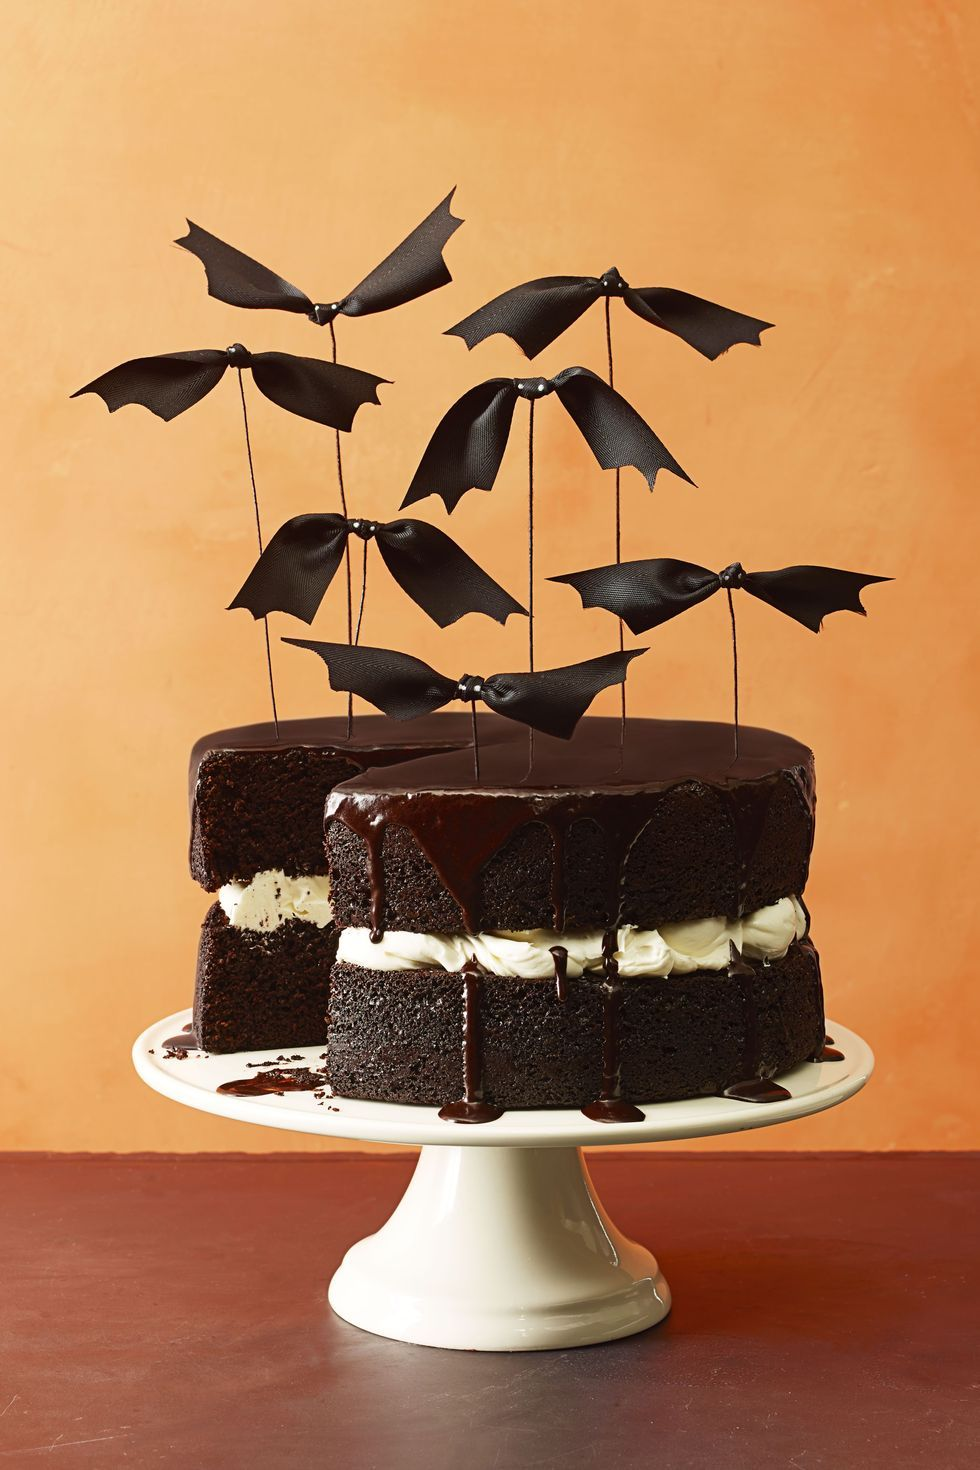 17 Fun Halloween Birthday Party Ideas Halloween Birthday Ideas For Kids And Adults